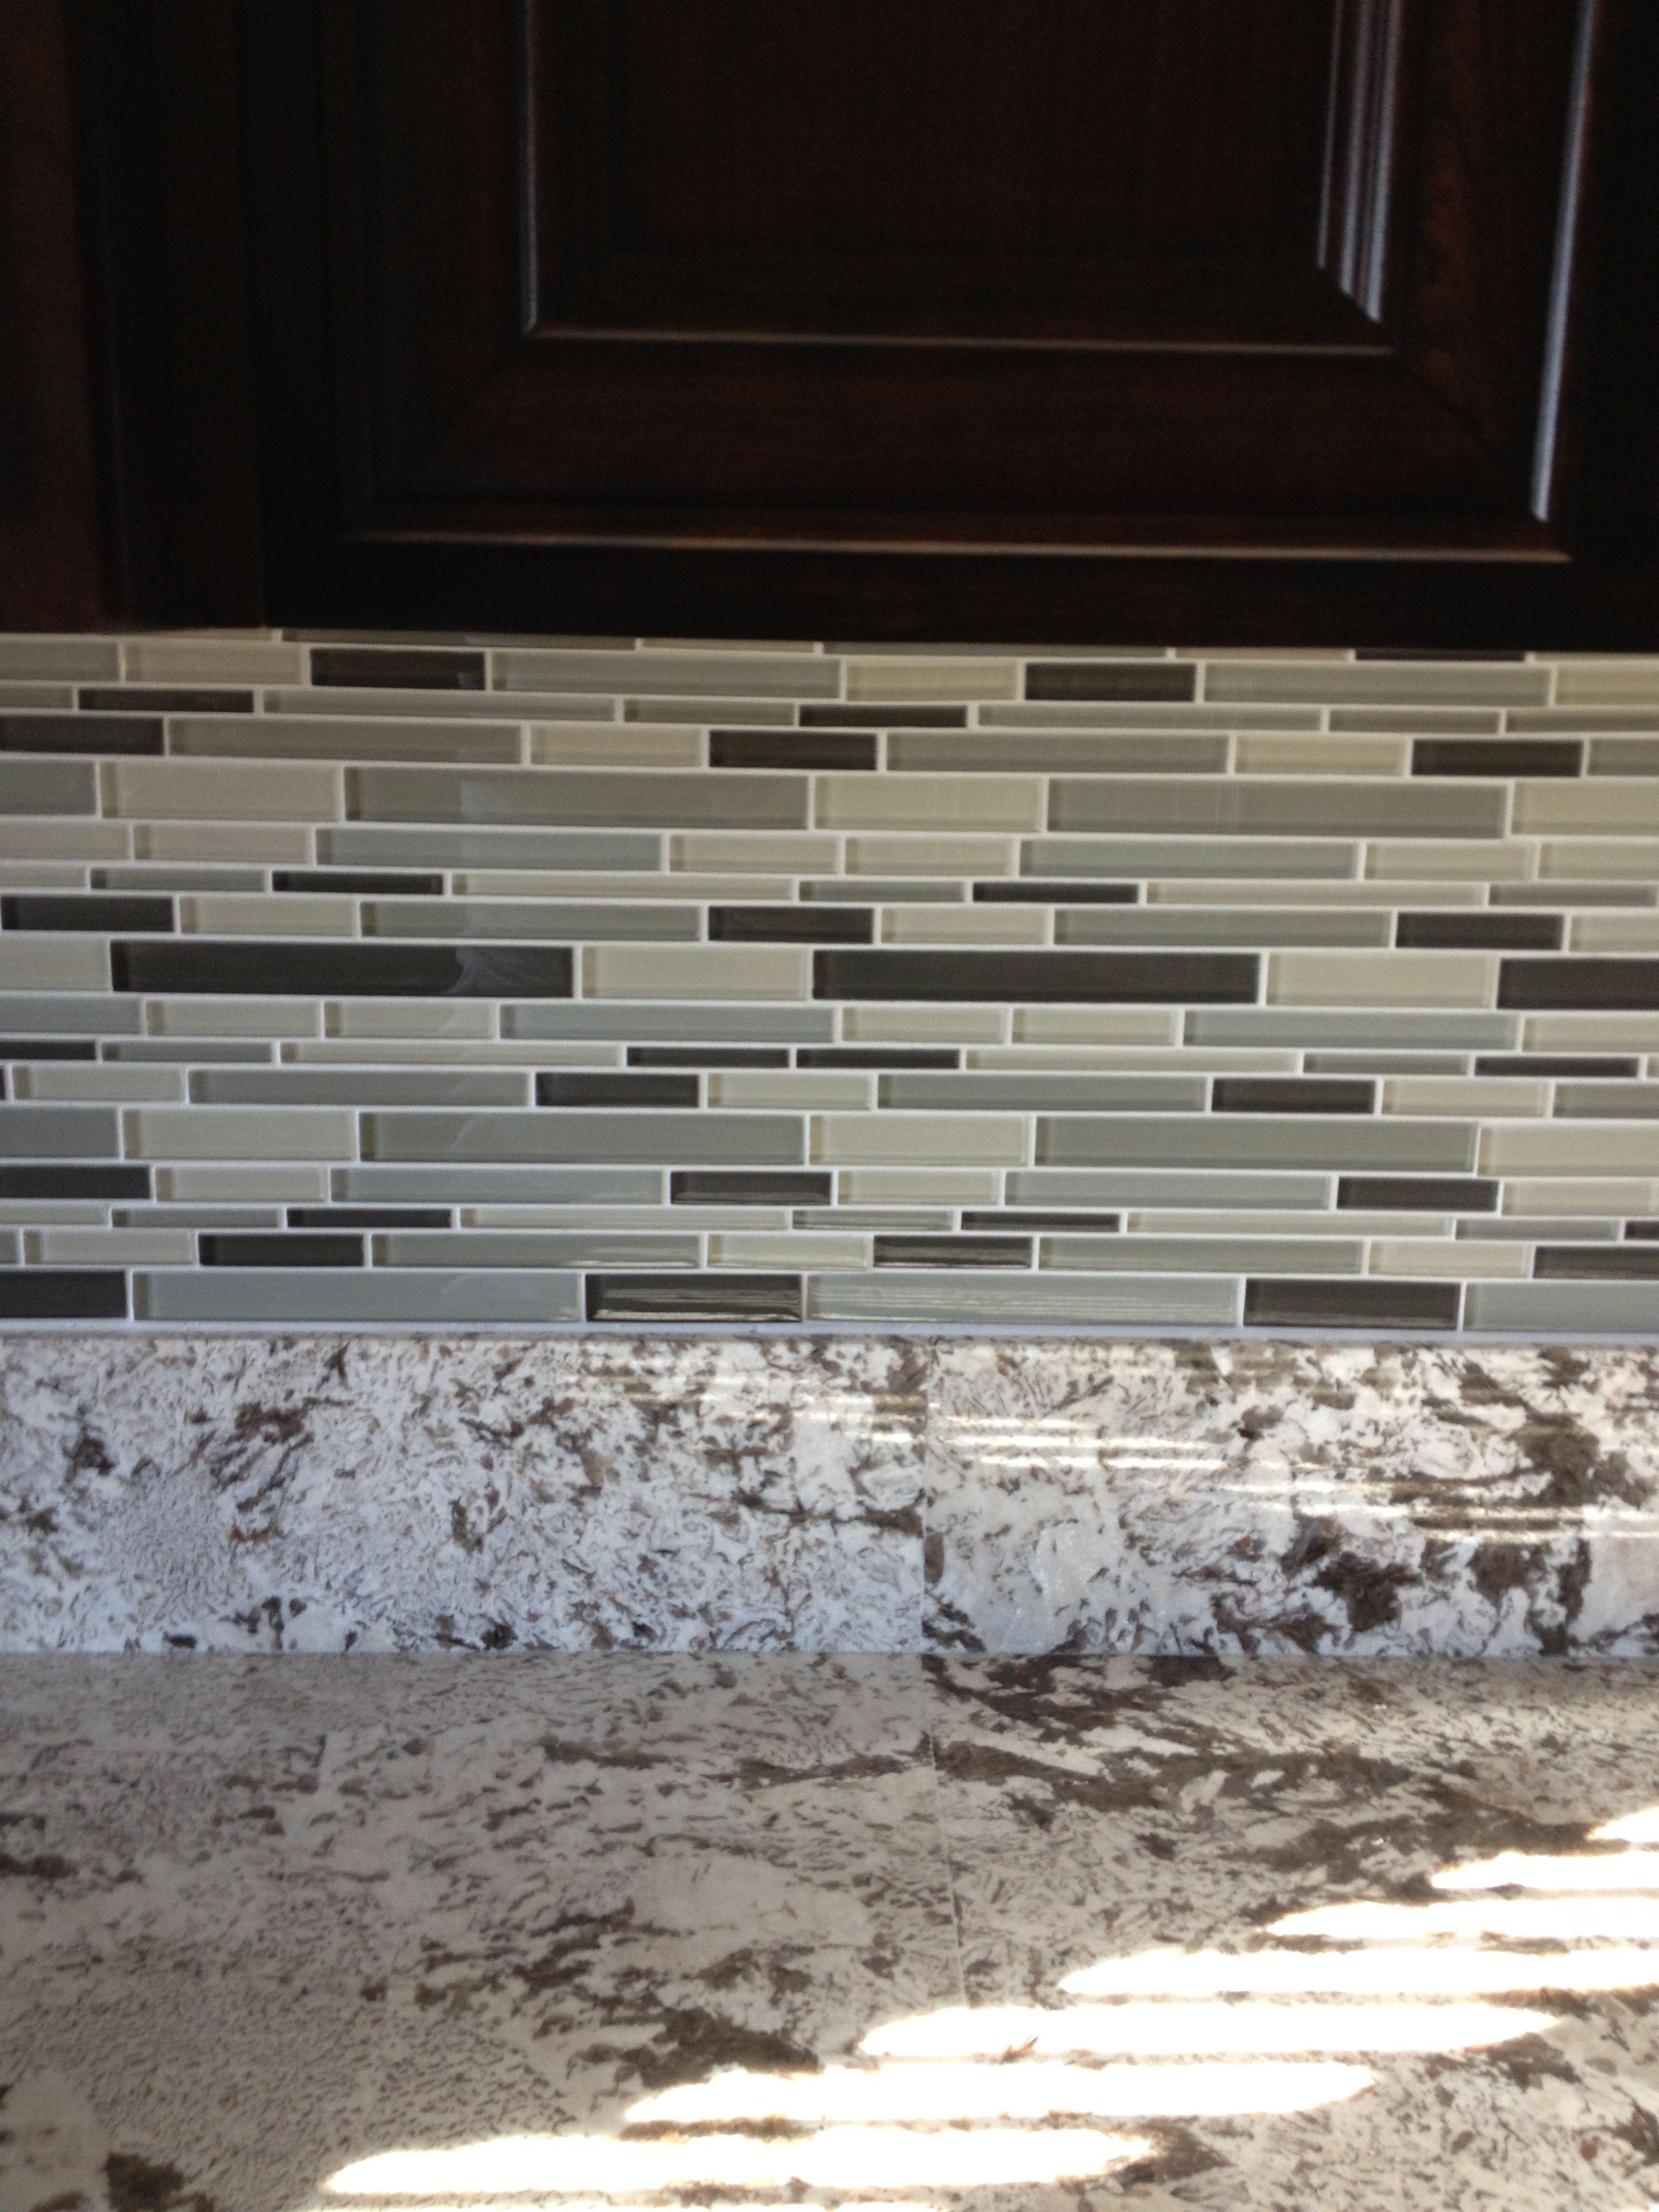 Glass tile backsplash I had installed by Lowes... Love it